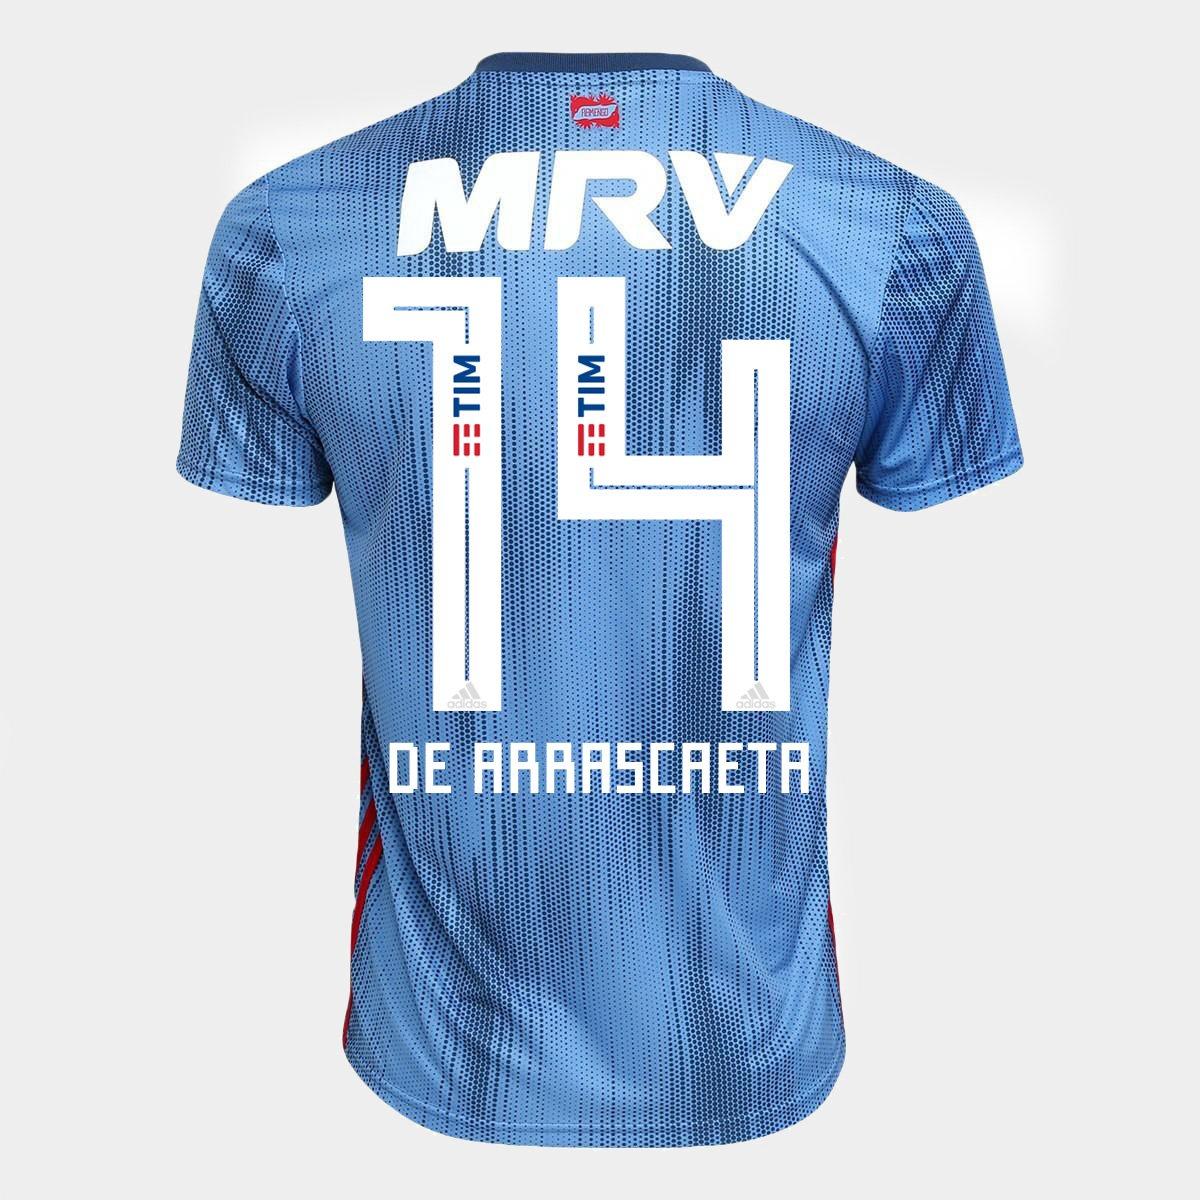 Camisa Flamengo III 18 19 n°14 De Arrascaeta - Torcedor Adidas Masculina -  Azul - Compre Agora  5fc83415221